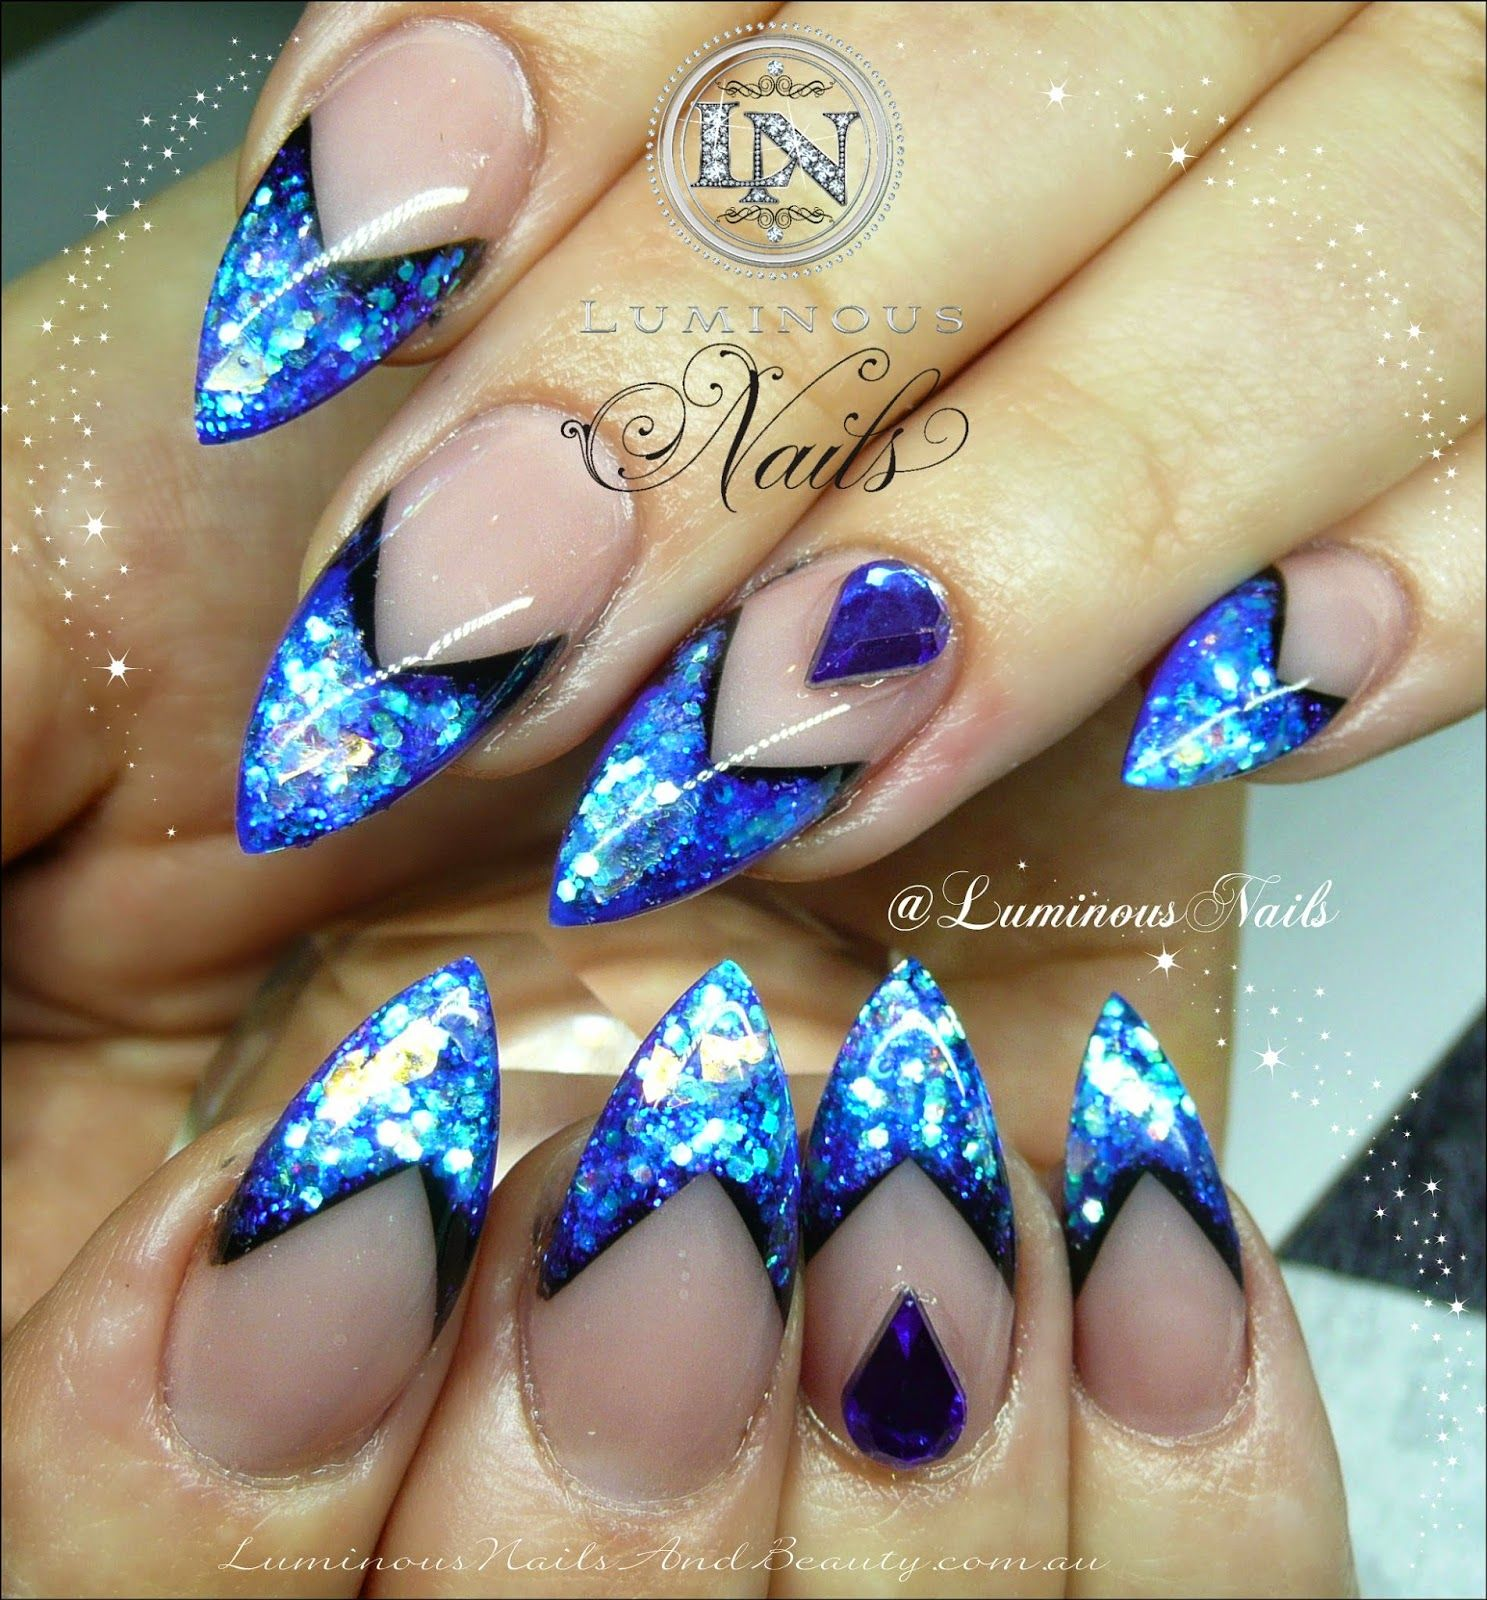 Luminous Nails: Glittery Royal Blue Nails...   Nail   Pinterest ...